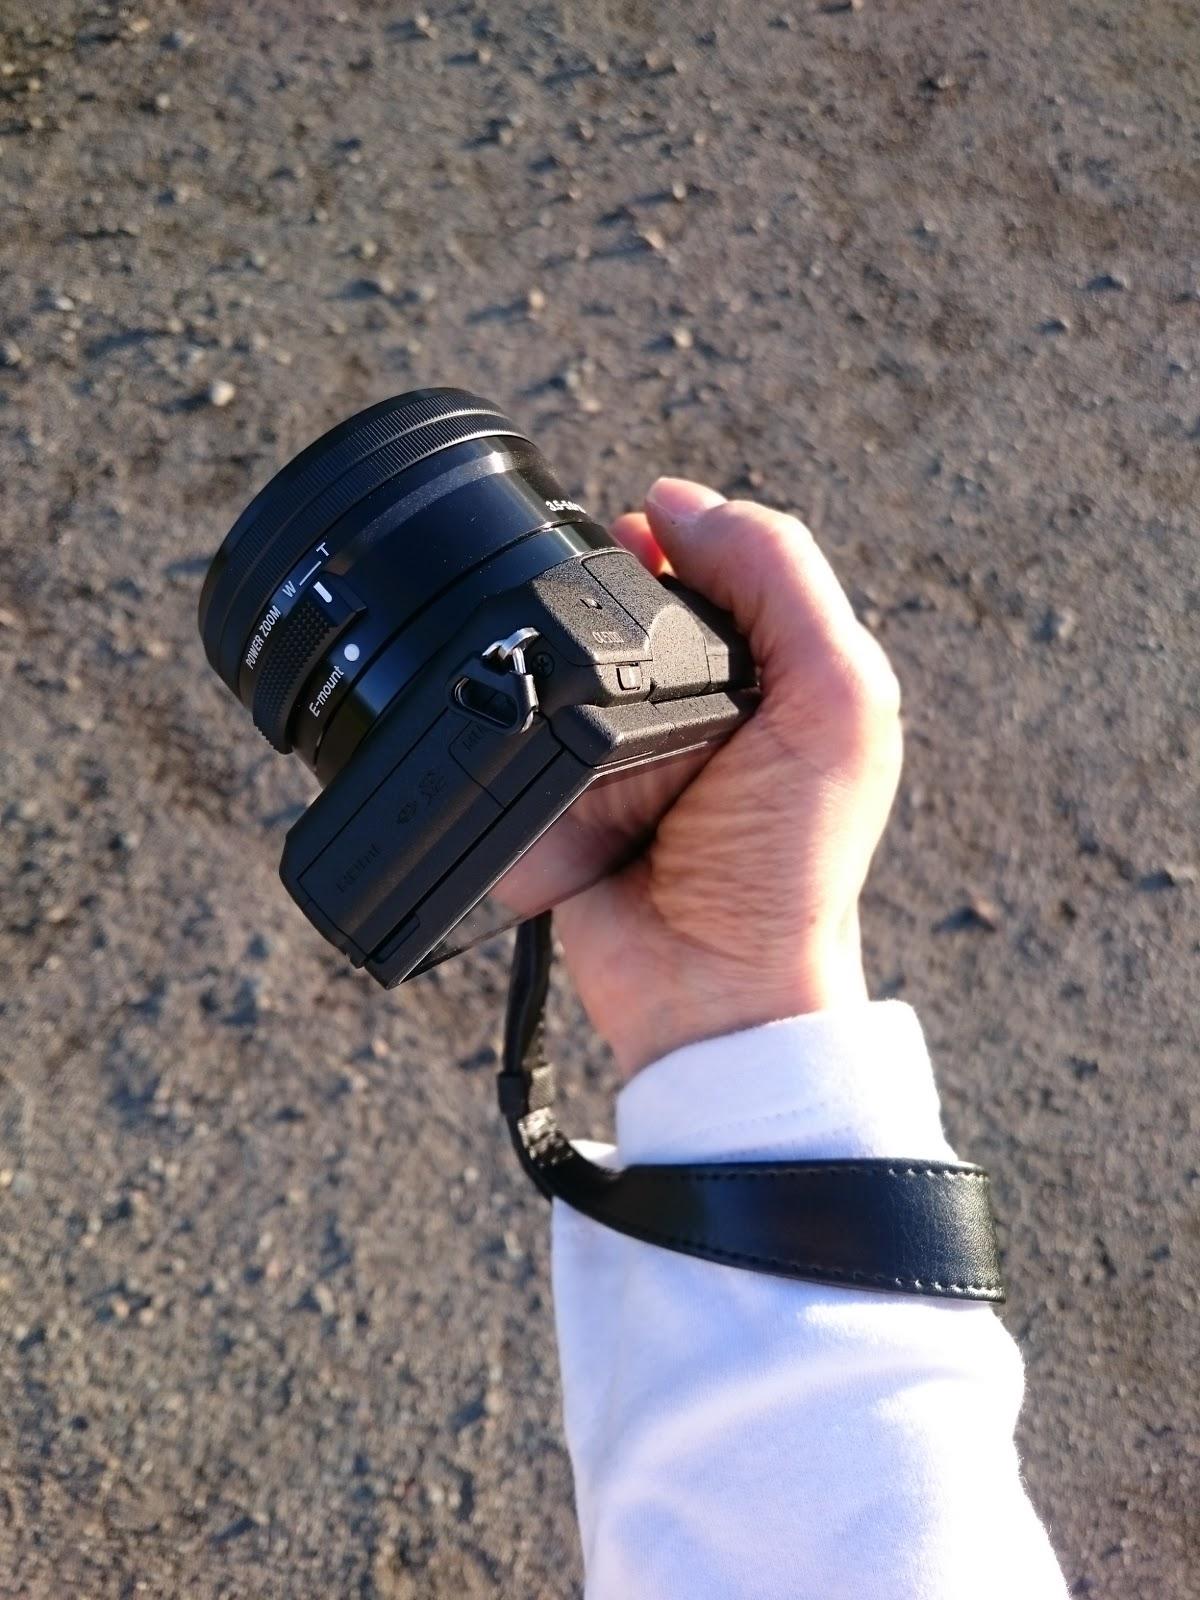 Sonyの一眼カメラのリストストラップのEマウント用のSTP-WS2の黒を付けてα5100を持っている右手